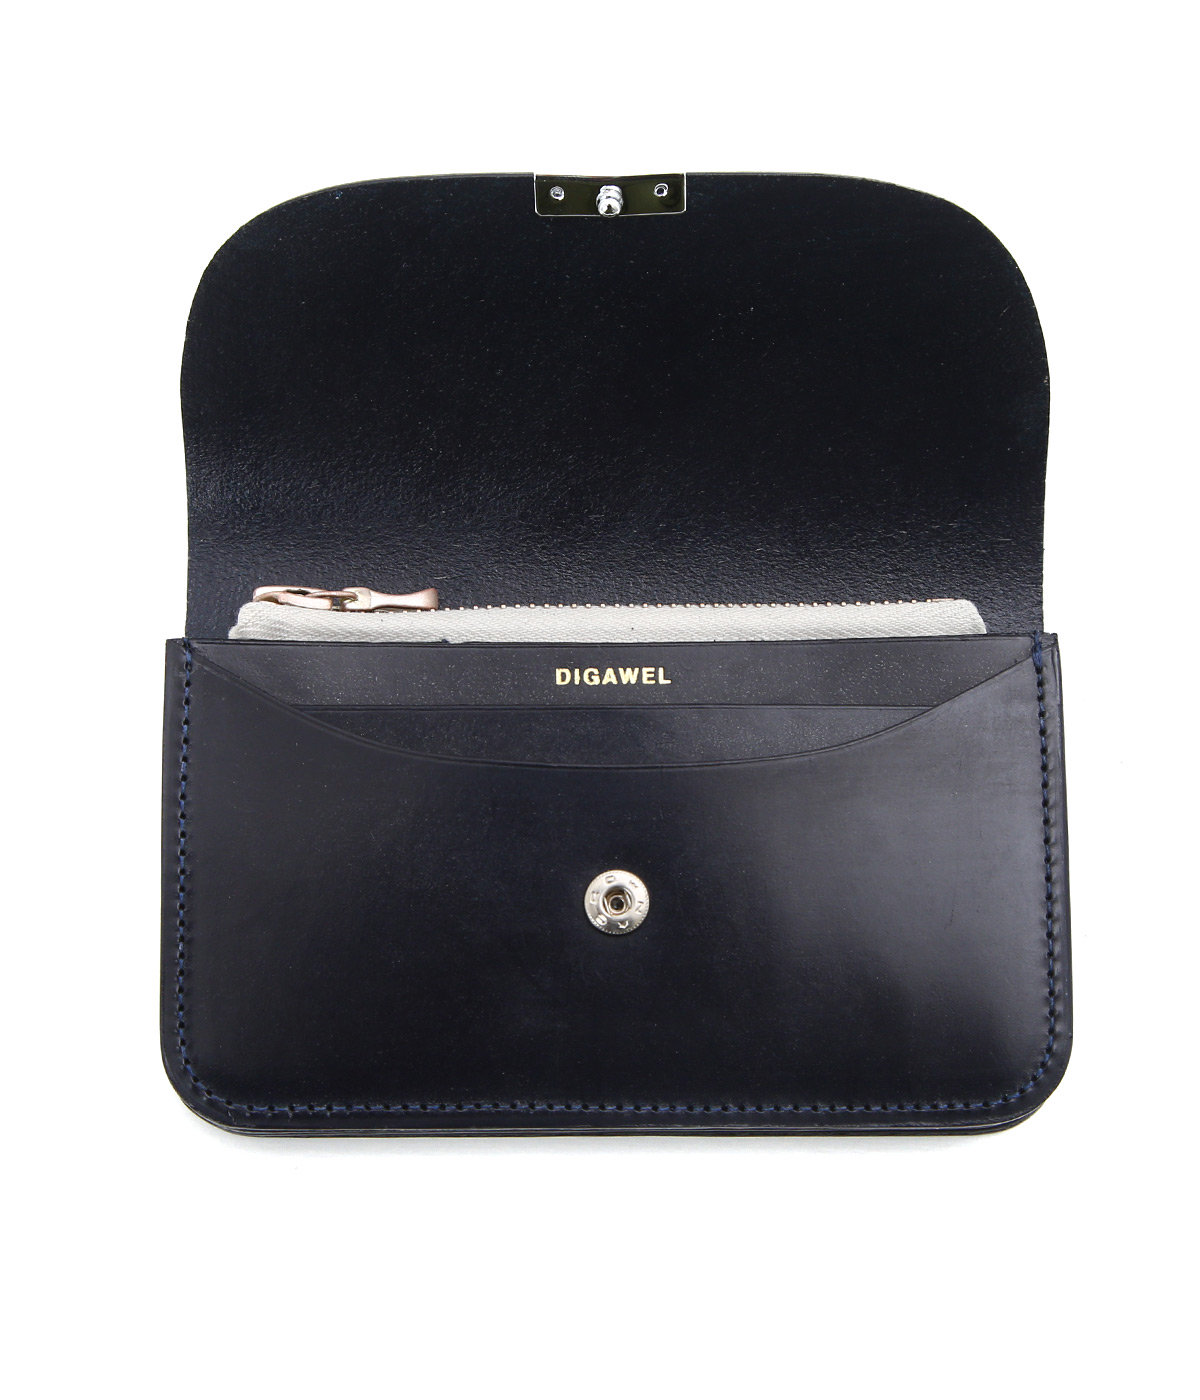 GARSON PURSE -Bridle leather-